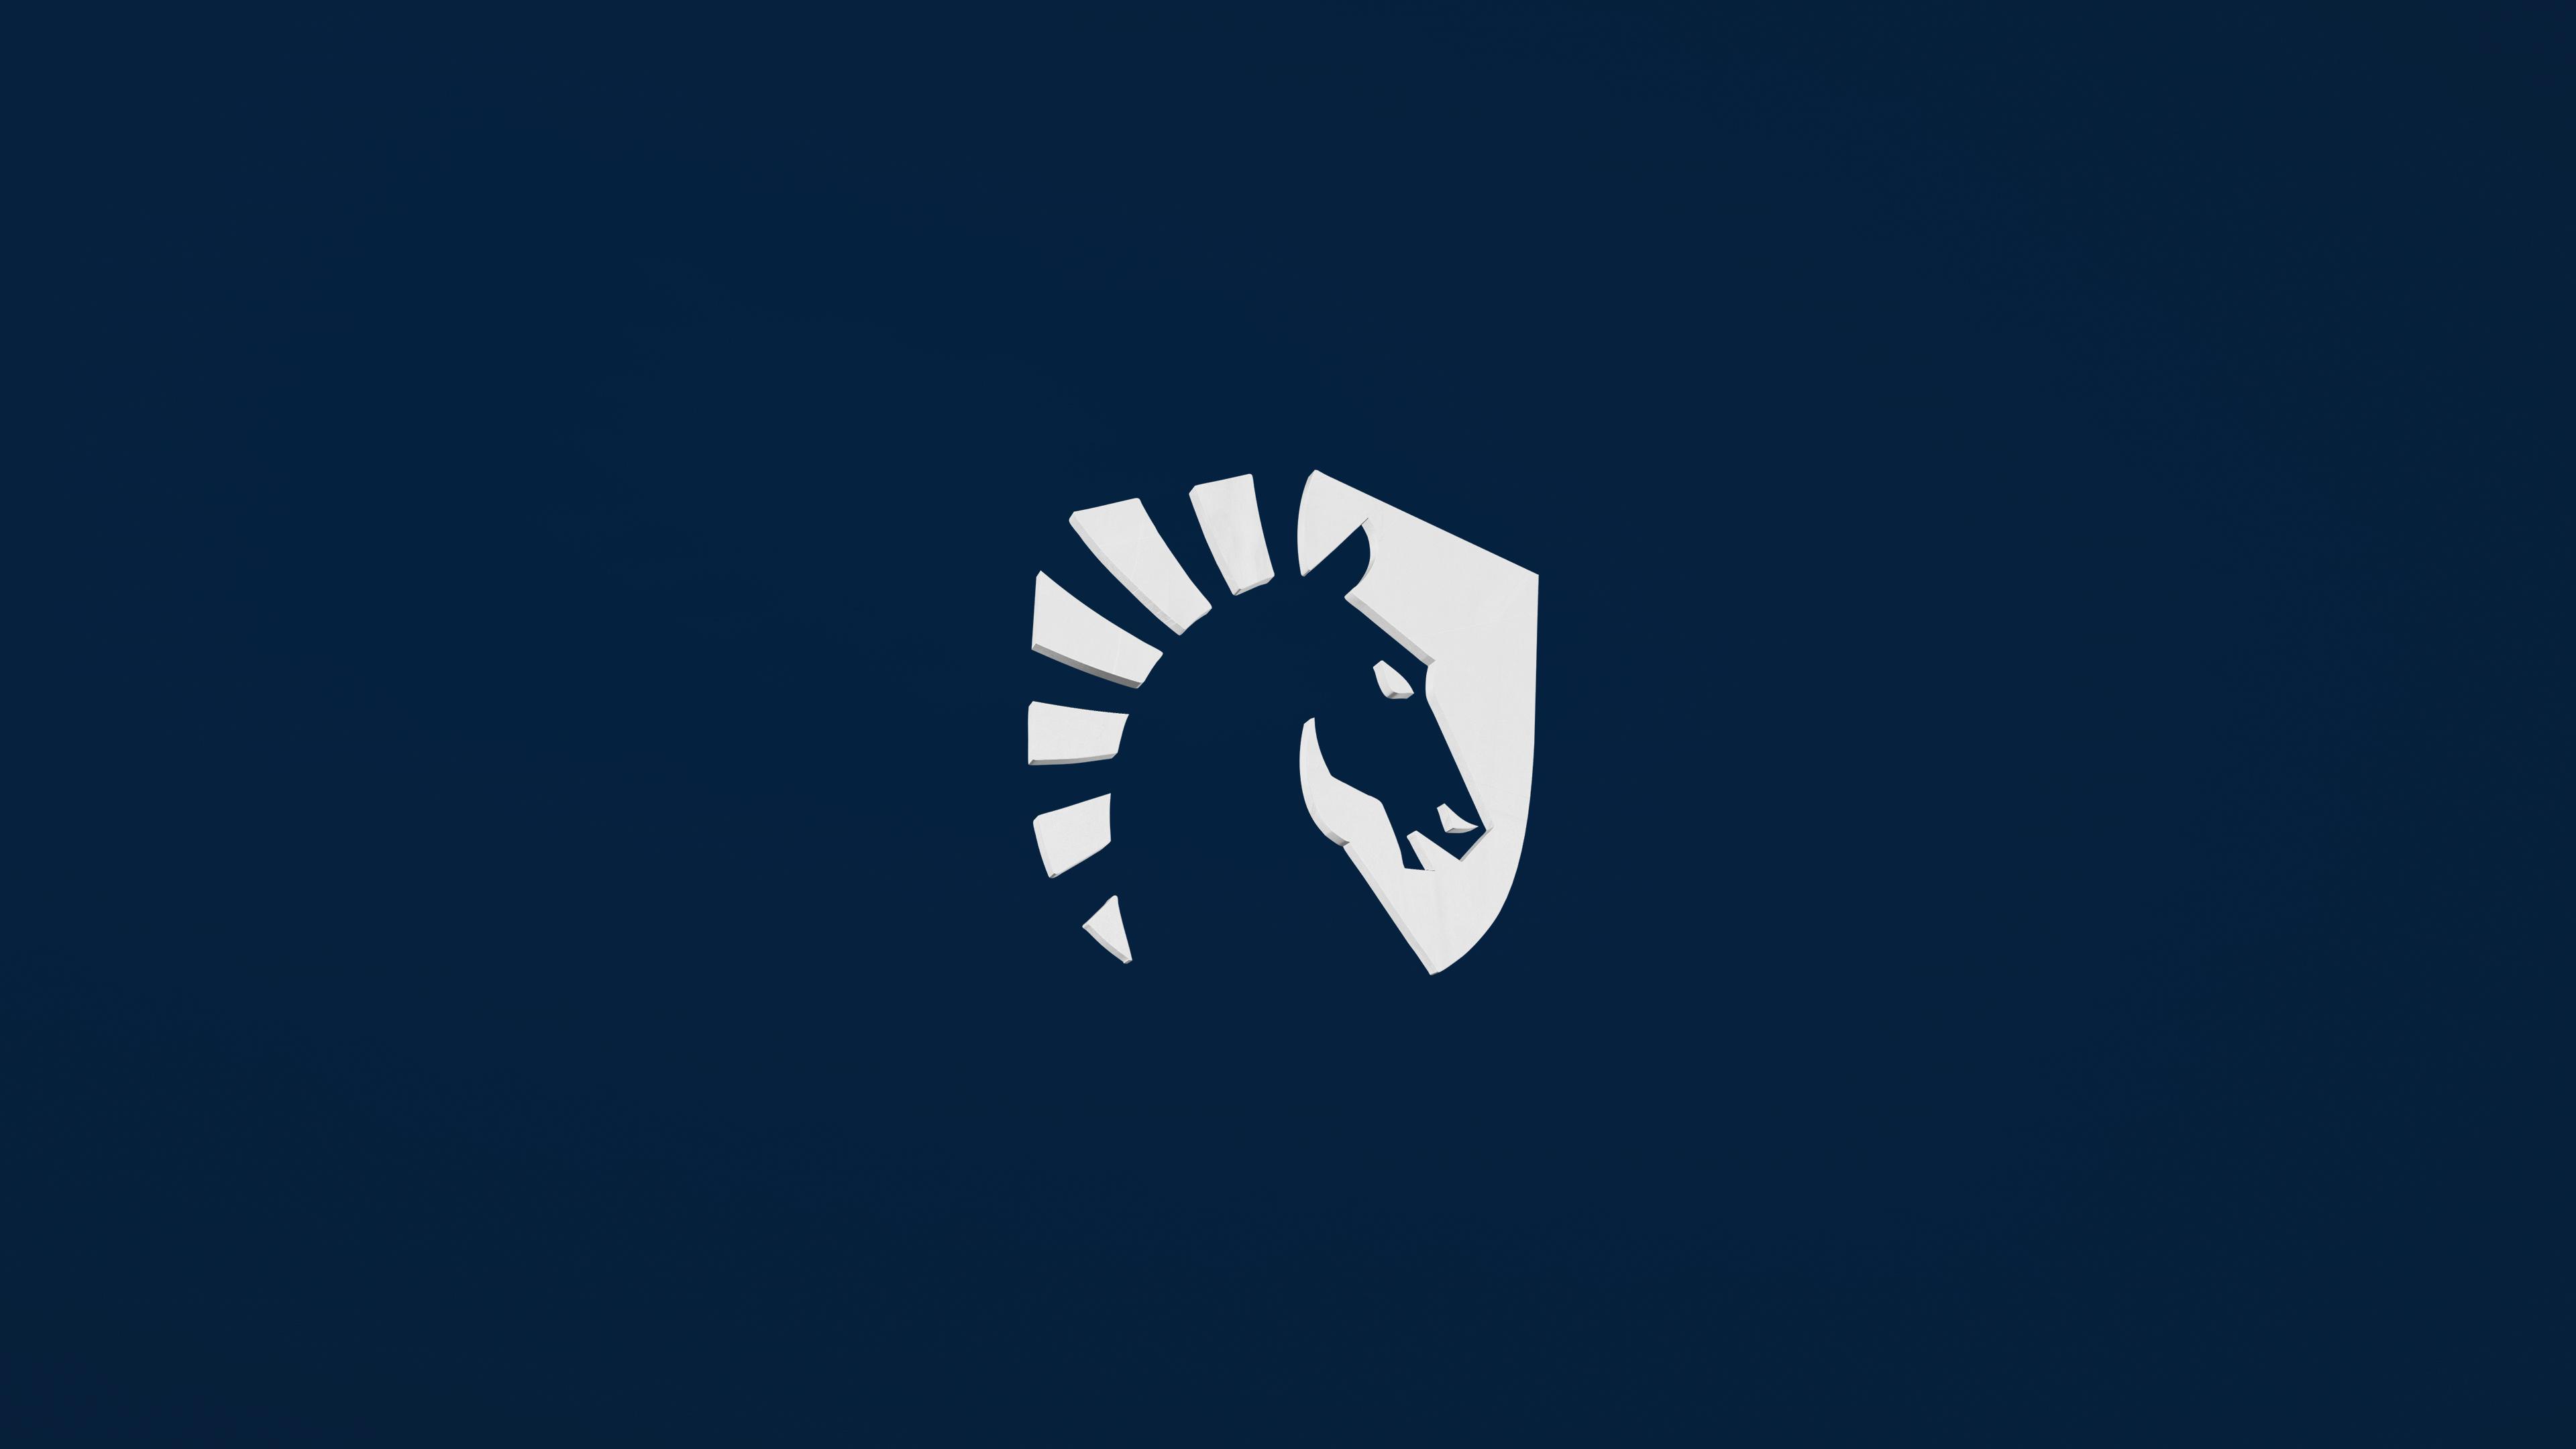 Sfondi logo windows 10